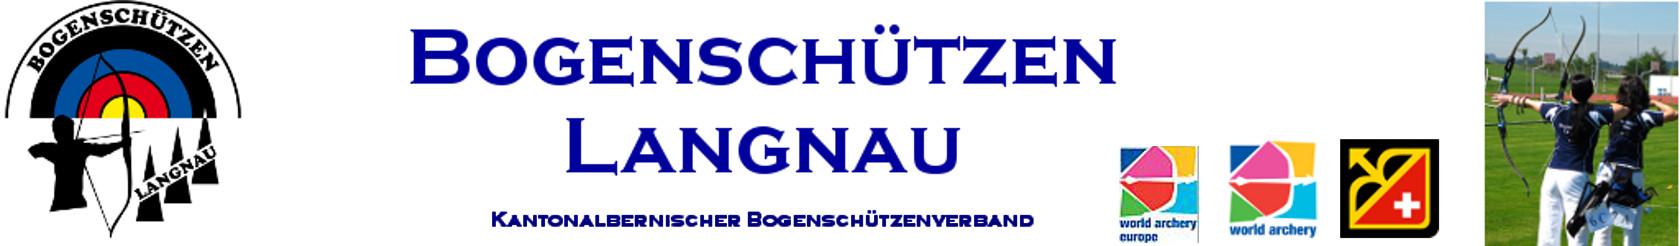 Bogenschützen Langnau